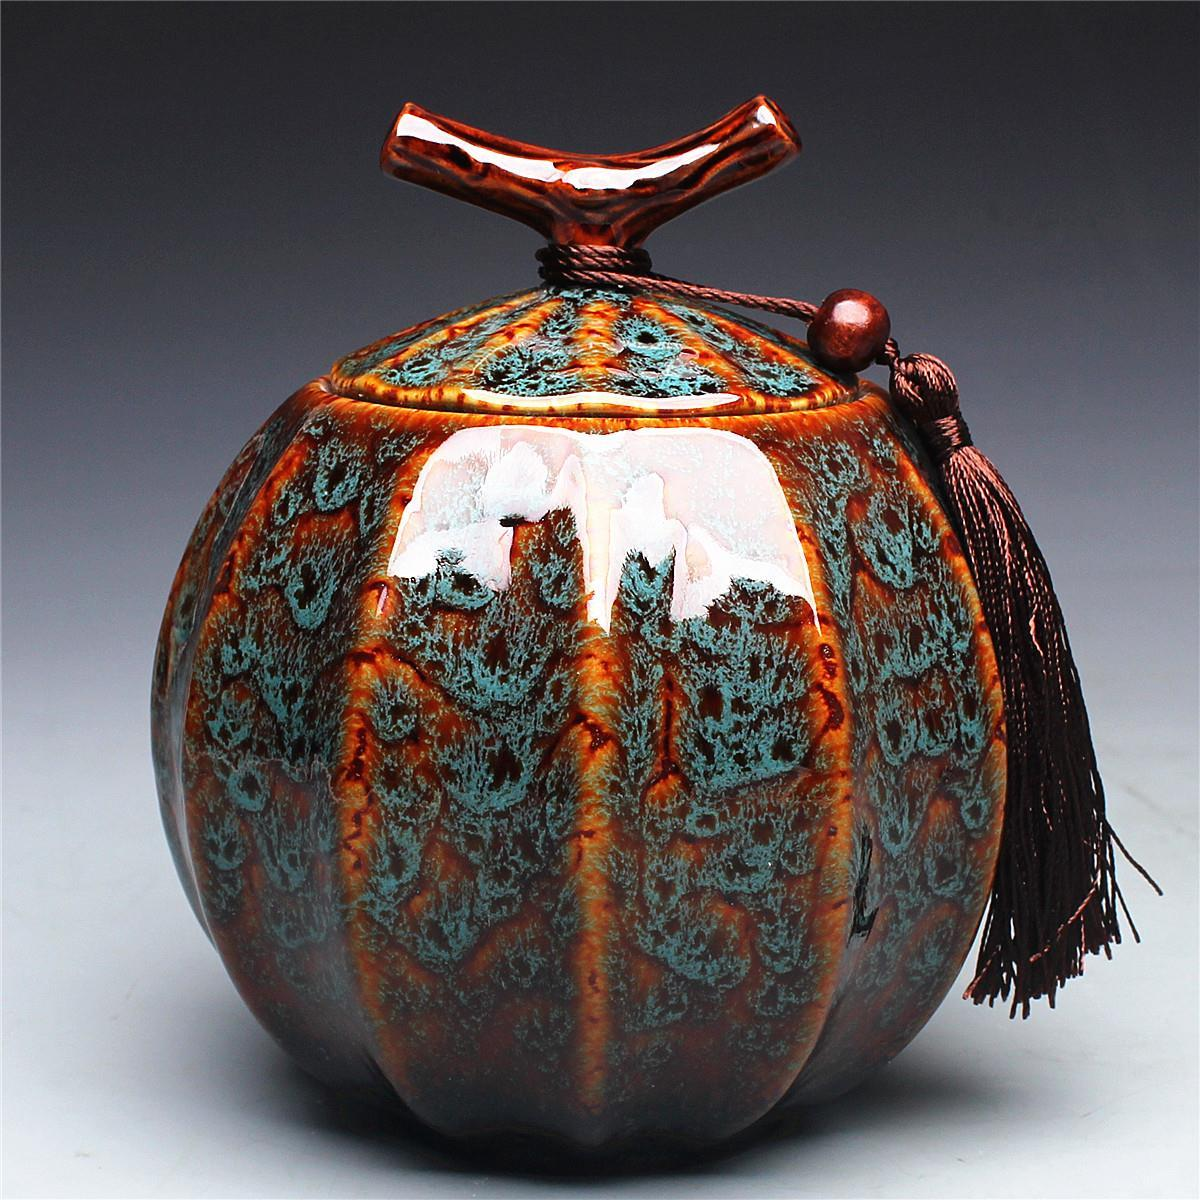 Pumpkin-Style-Tea-Jar-Ceramic-Tea-Barrel-Black-Tea-Sealed-Tank-Storage-Tank-Puer-Teacaddy-5.jpg